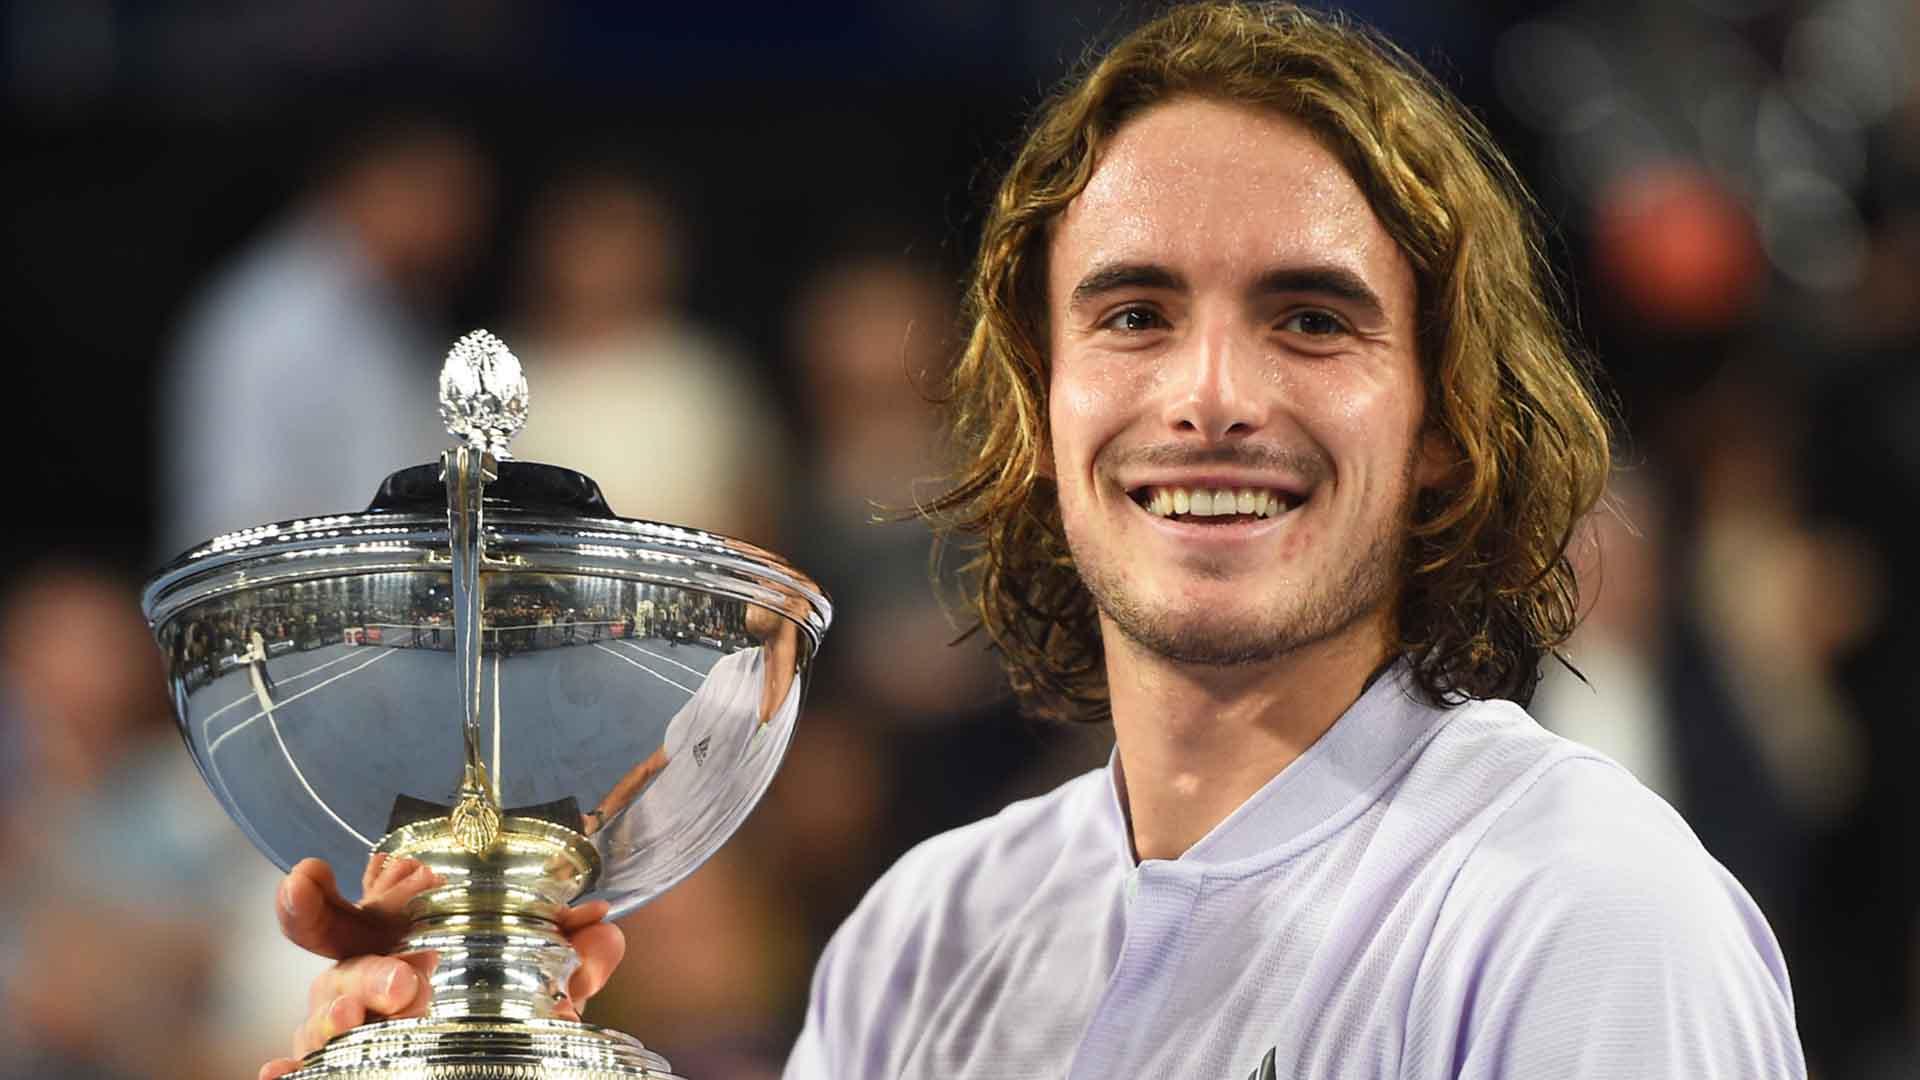 ATP MARSEILLE 2020 - Page 5 Tsitsipas-marseille-2020-final-trophy